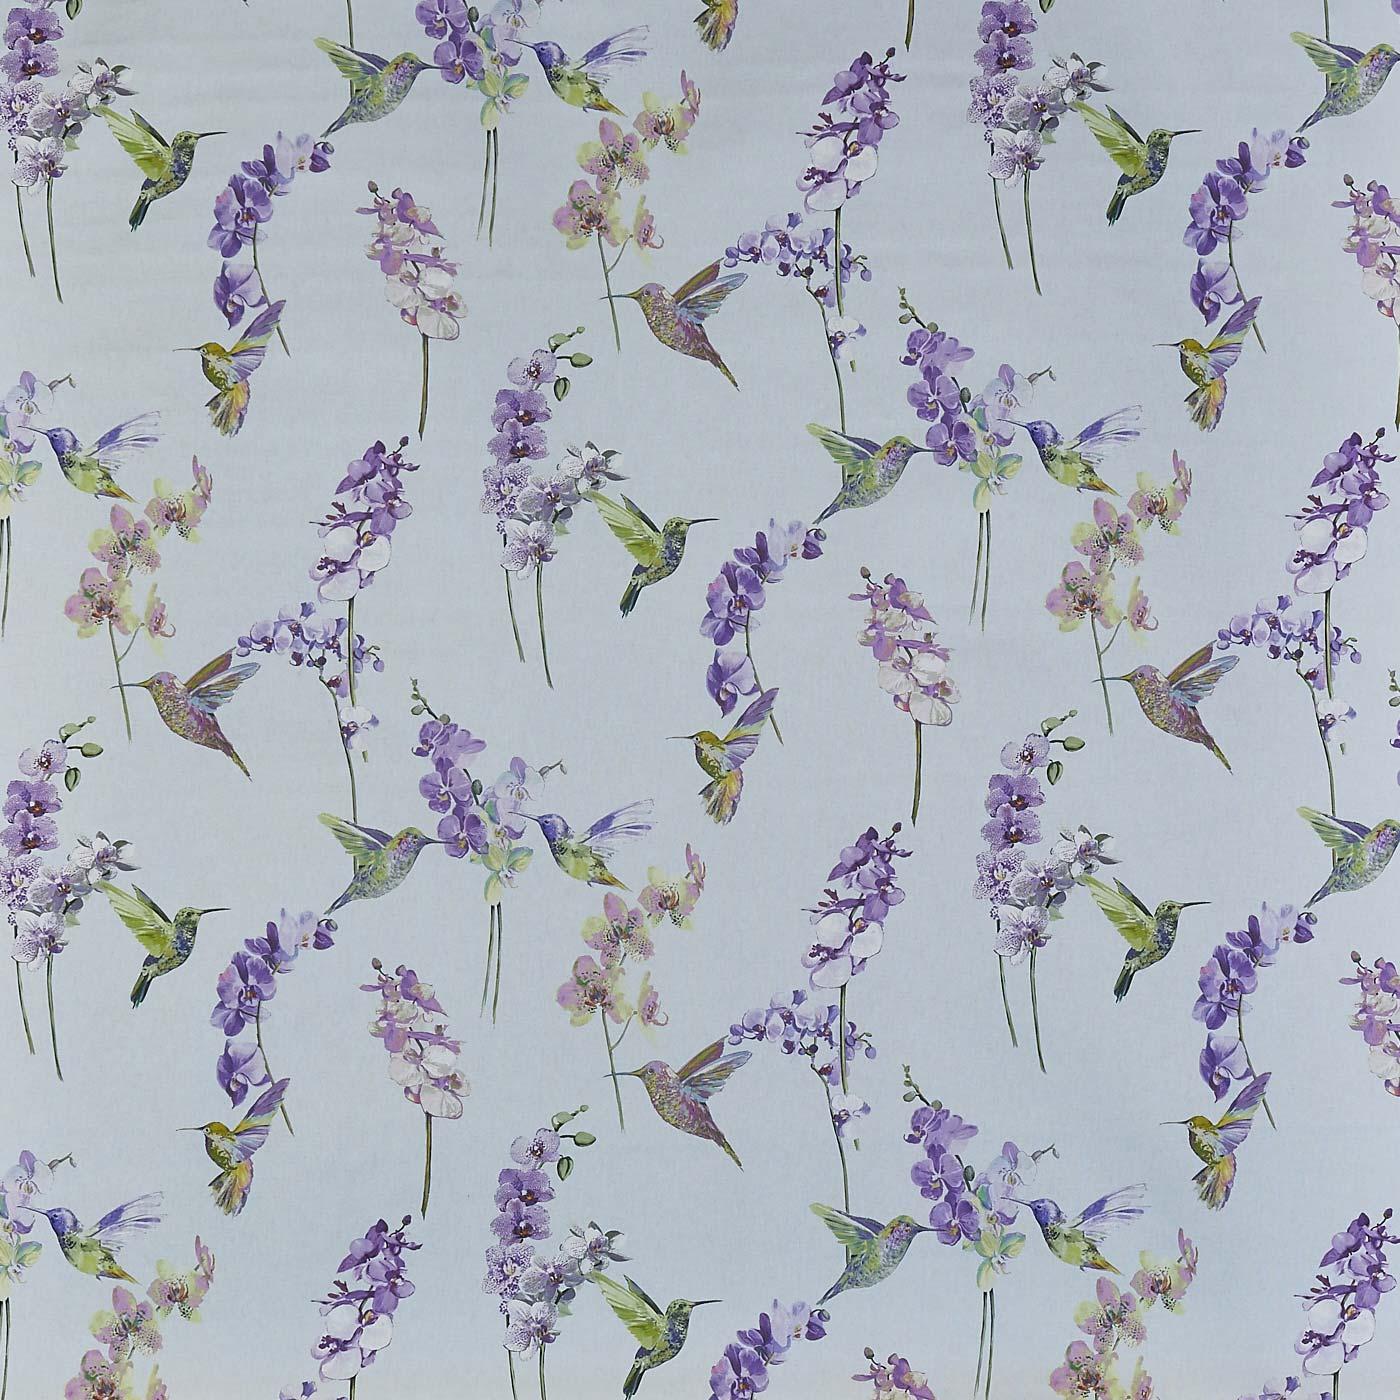 Humming Bird Hyacinth